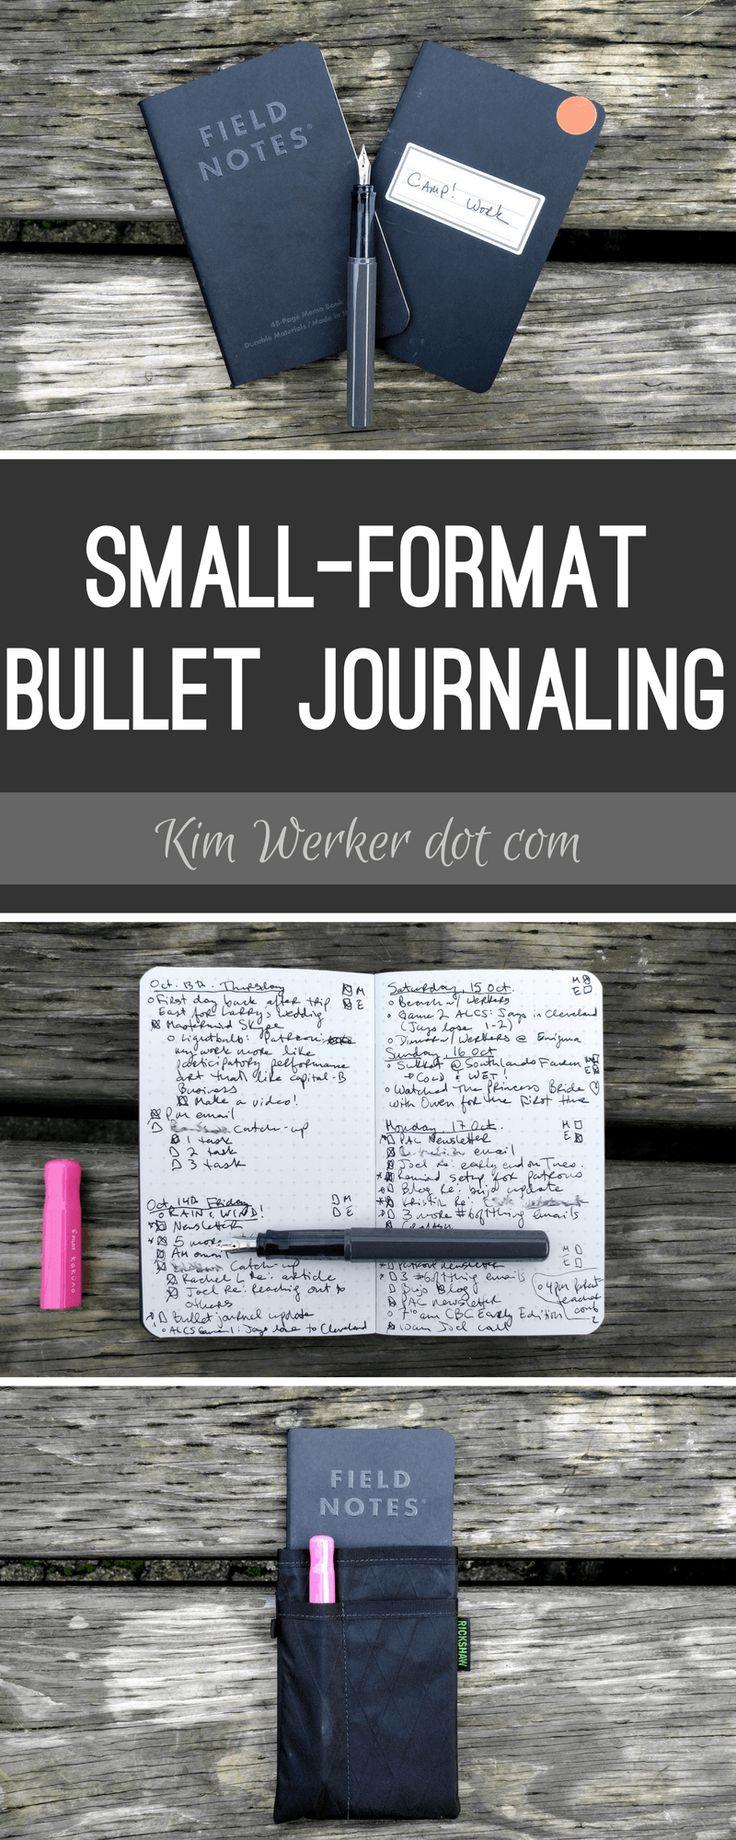 Small-format bullet journaling with PocketDojo and Field Notes – http://kimwerker.com/blog